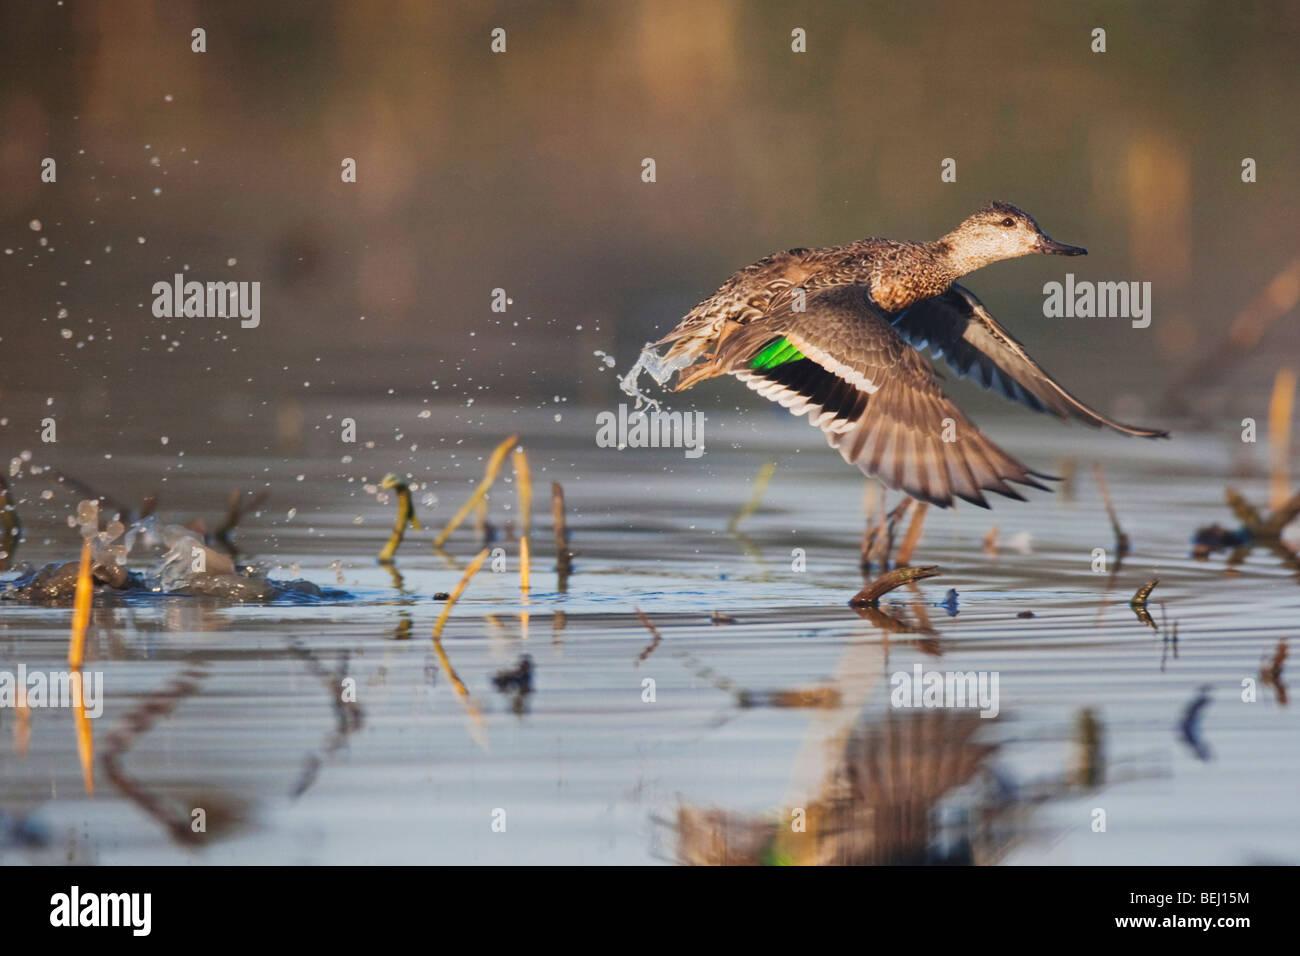 Green-winged Teal (Anas crecca), female taking off, Sinton, Corpus Christi, Coastal Bend, Texas, USA - Stock Image